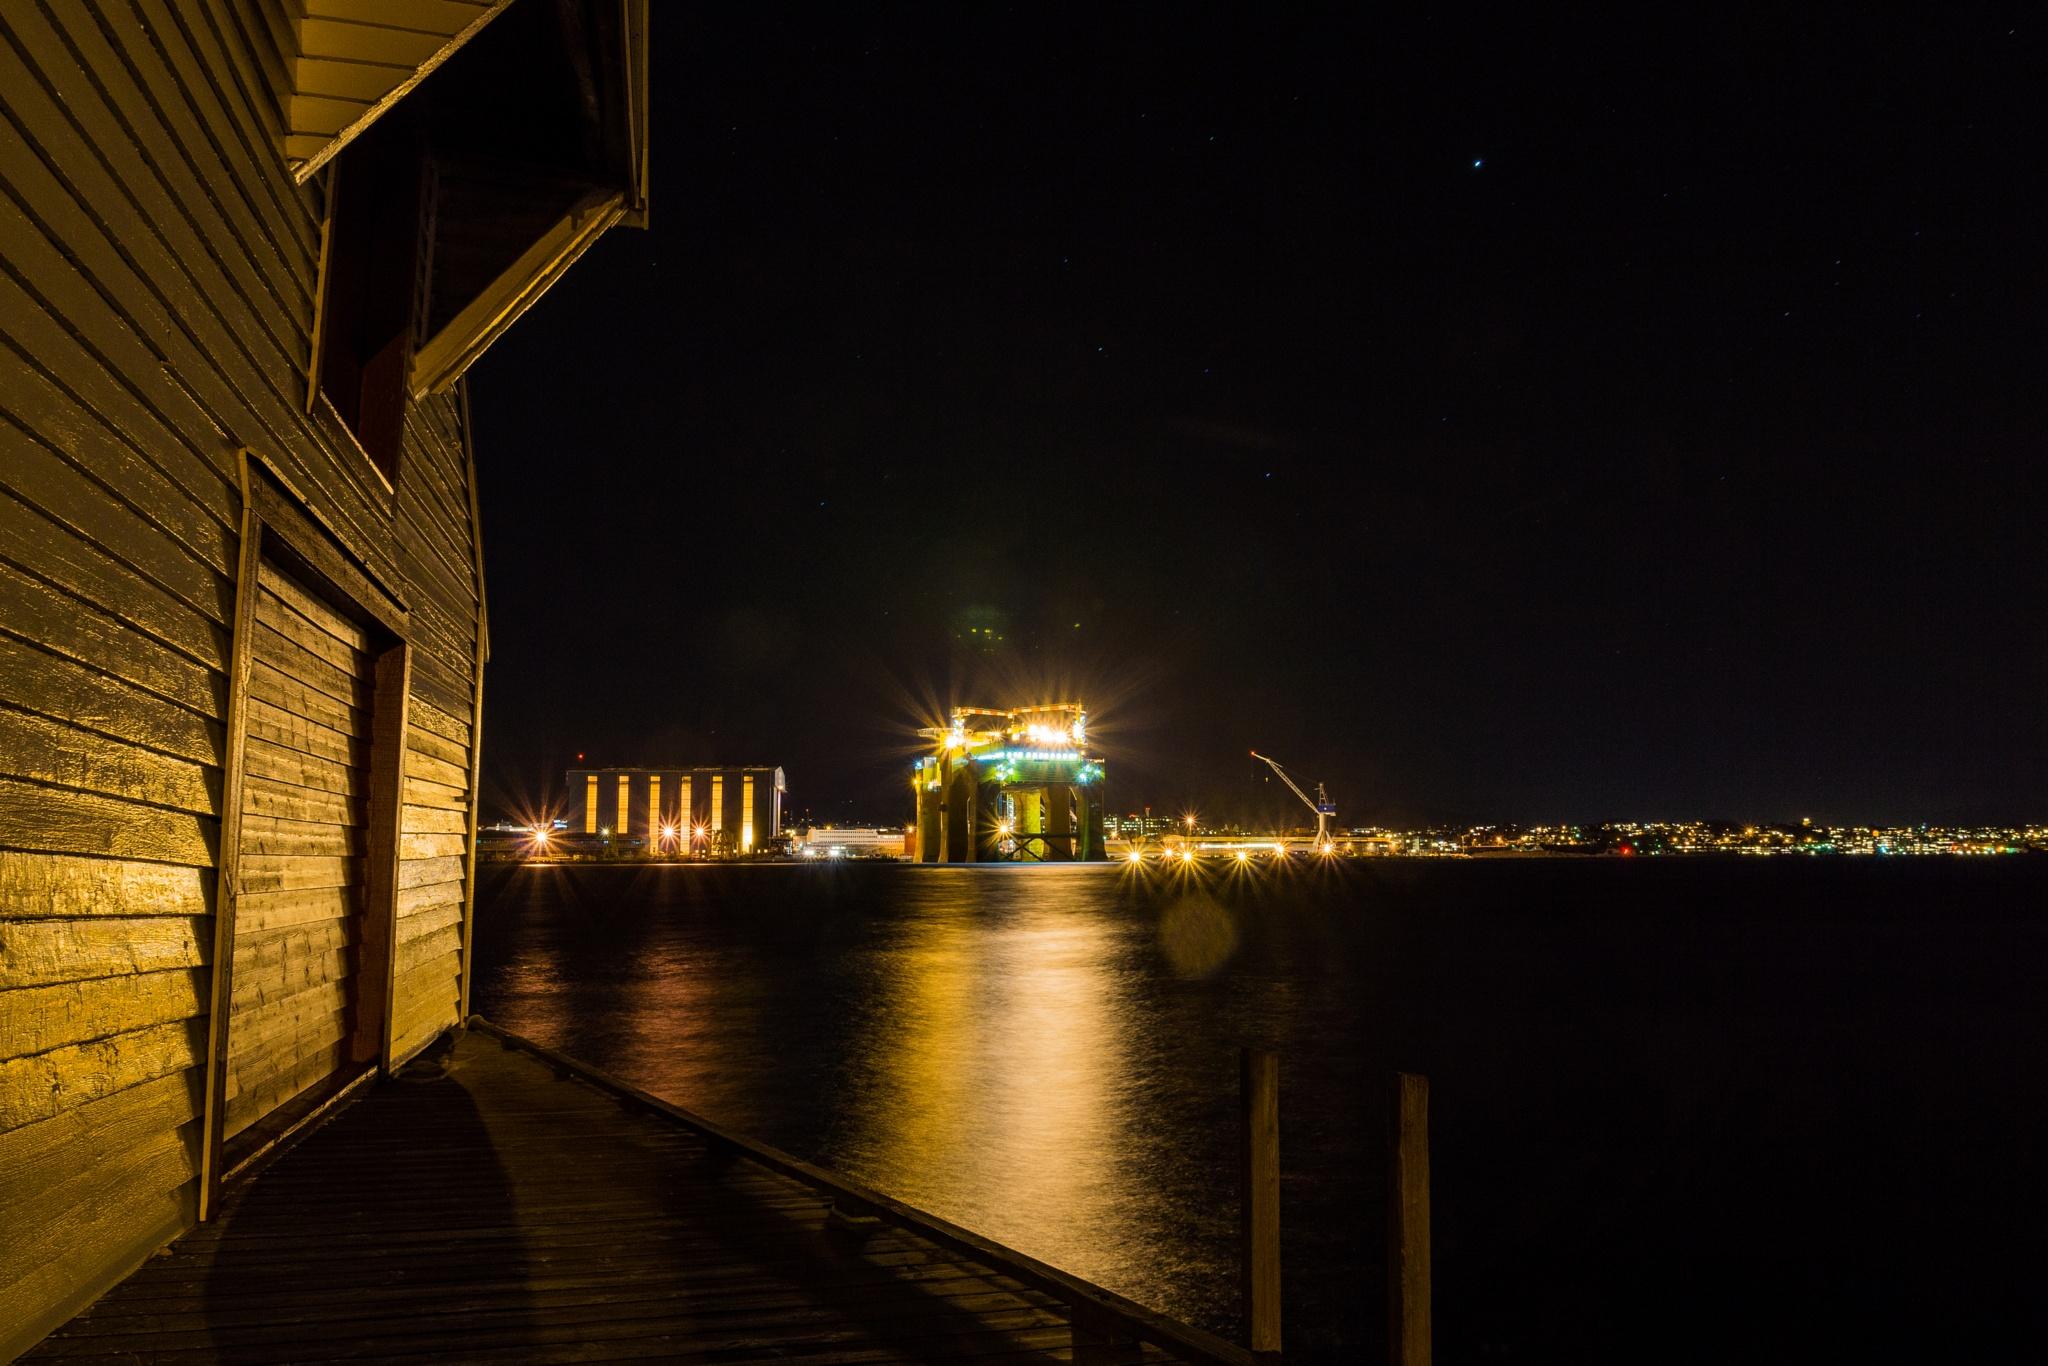 Shipyard by night by Mikal Lindøe